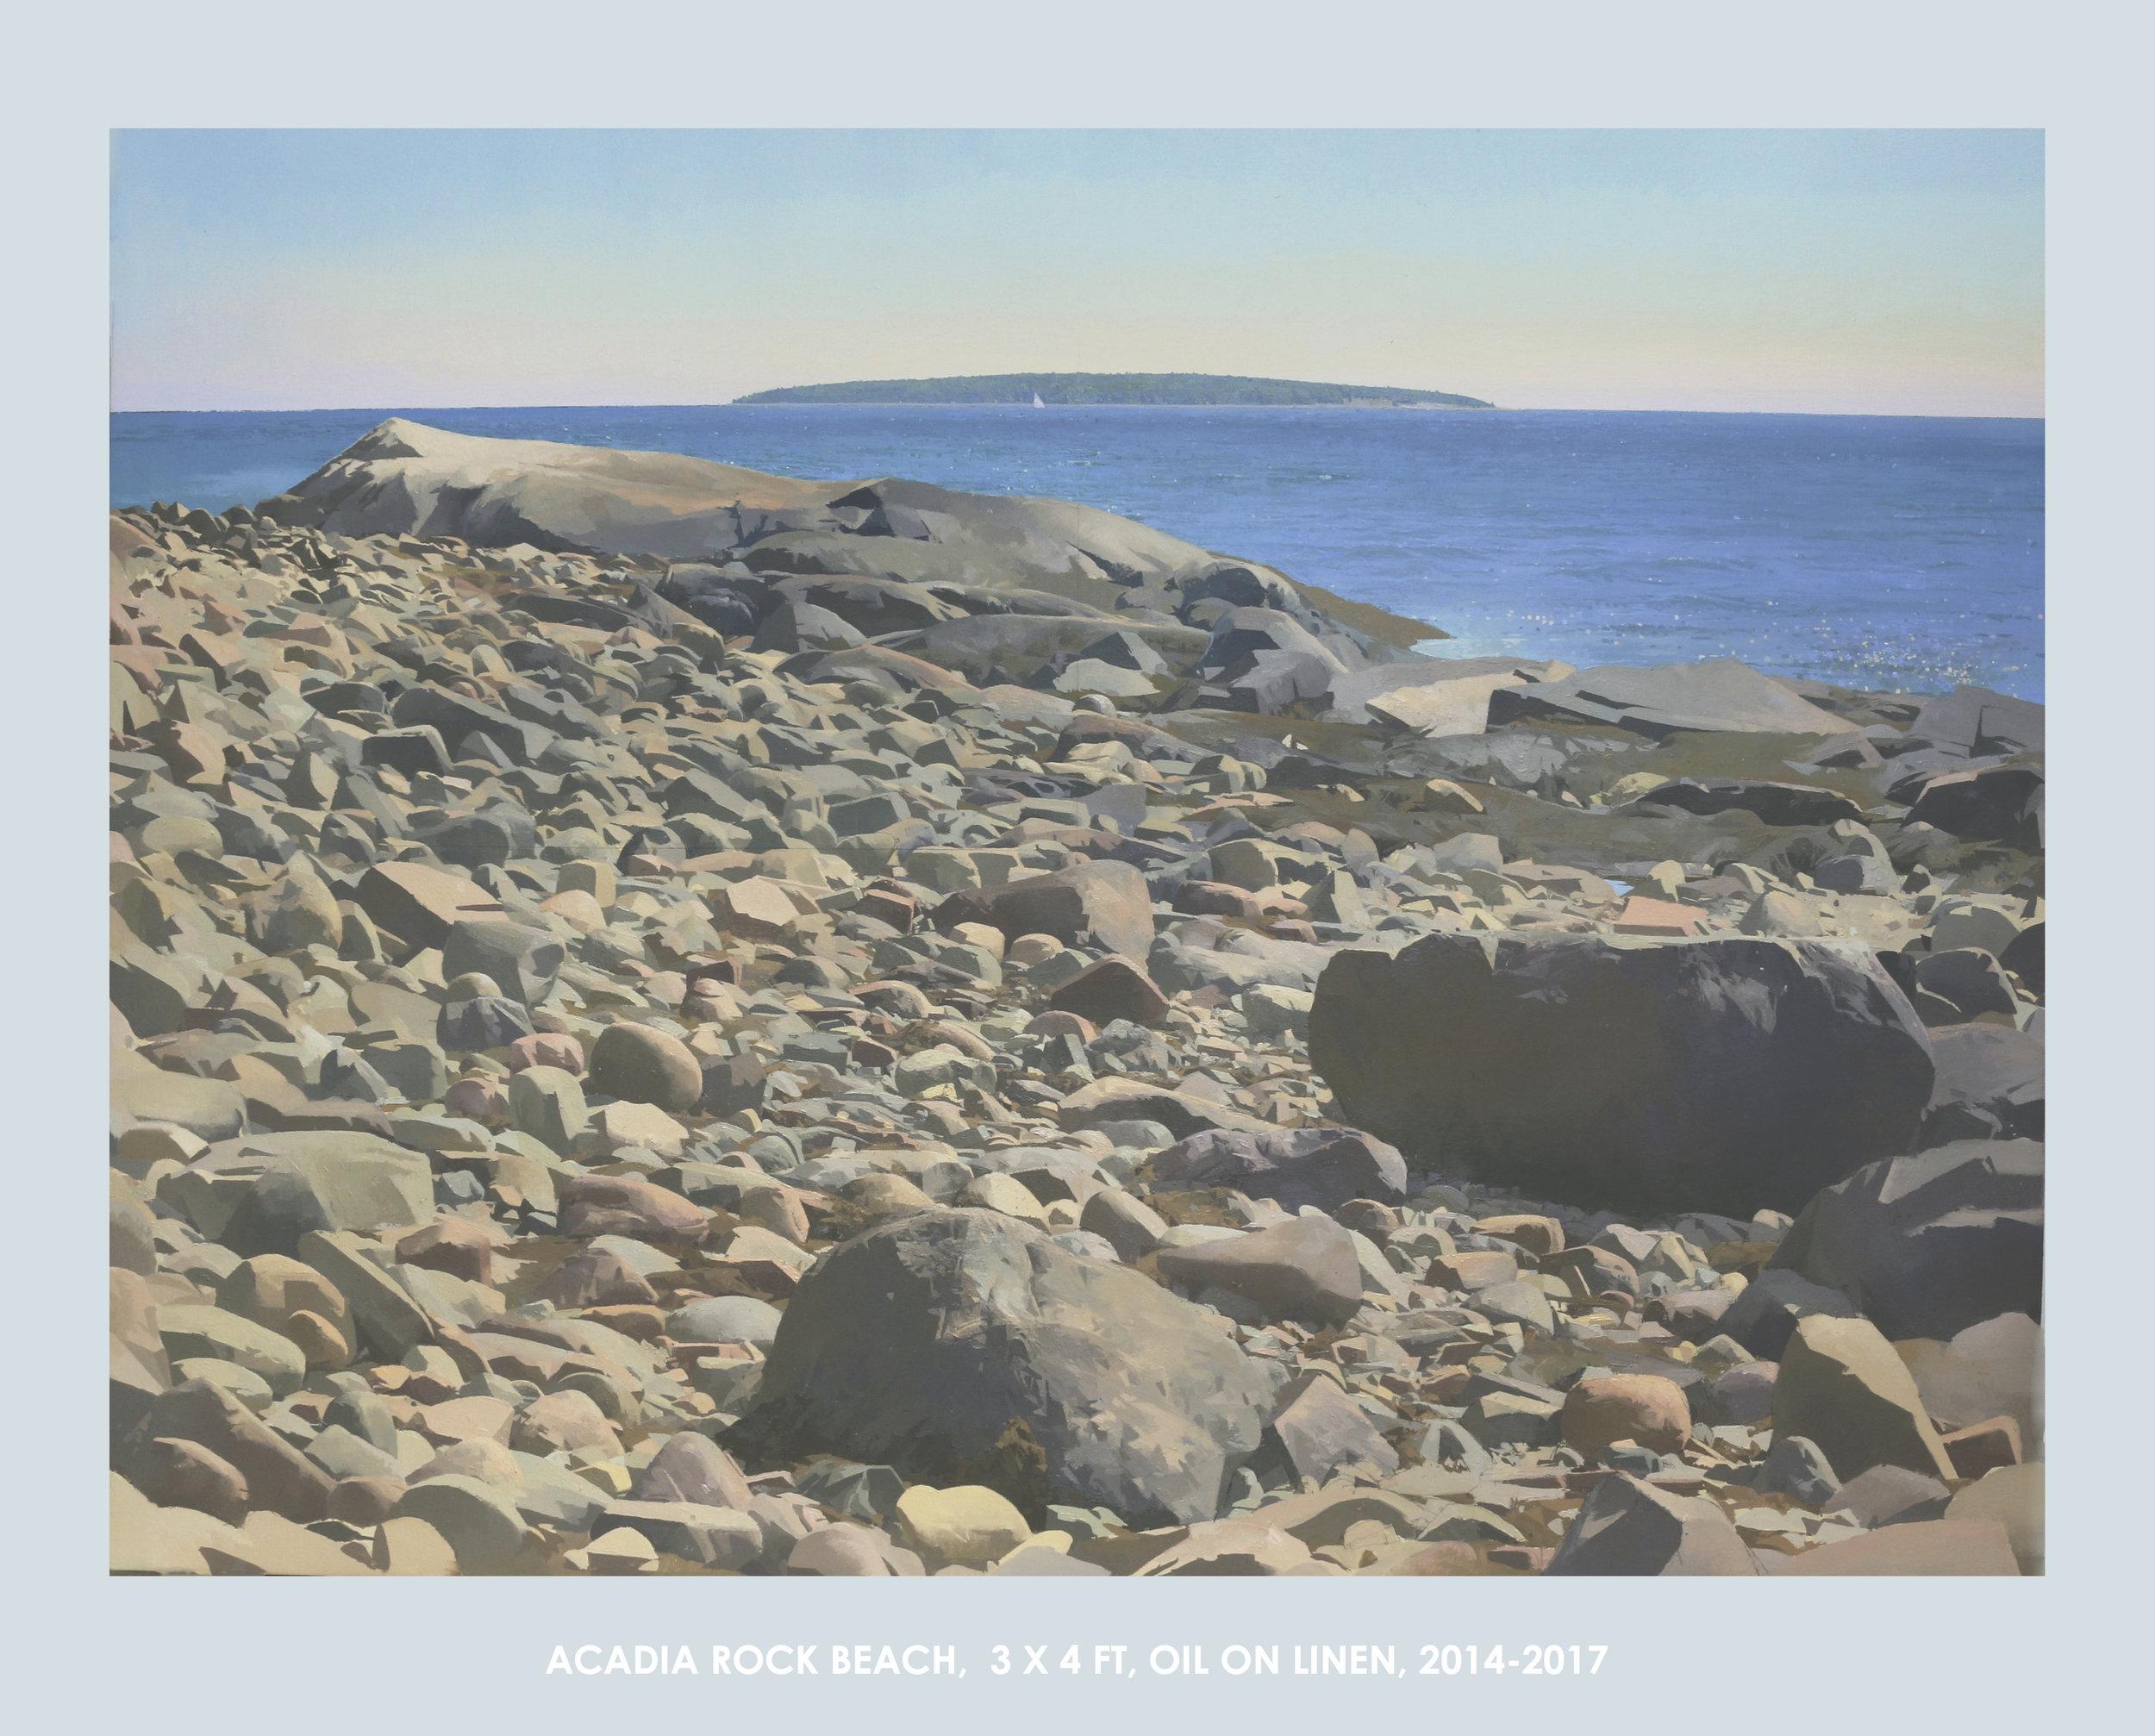 Acadia Rock Beach, 3x4 FT, Oil on Linen, 2014-2017 - Christopher S. Tietjen.jpg